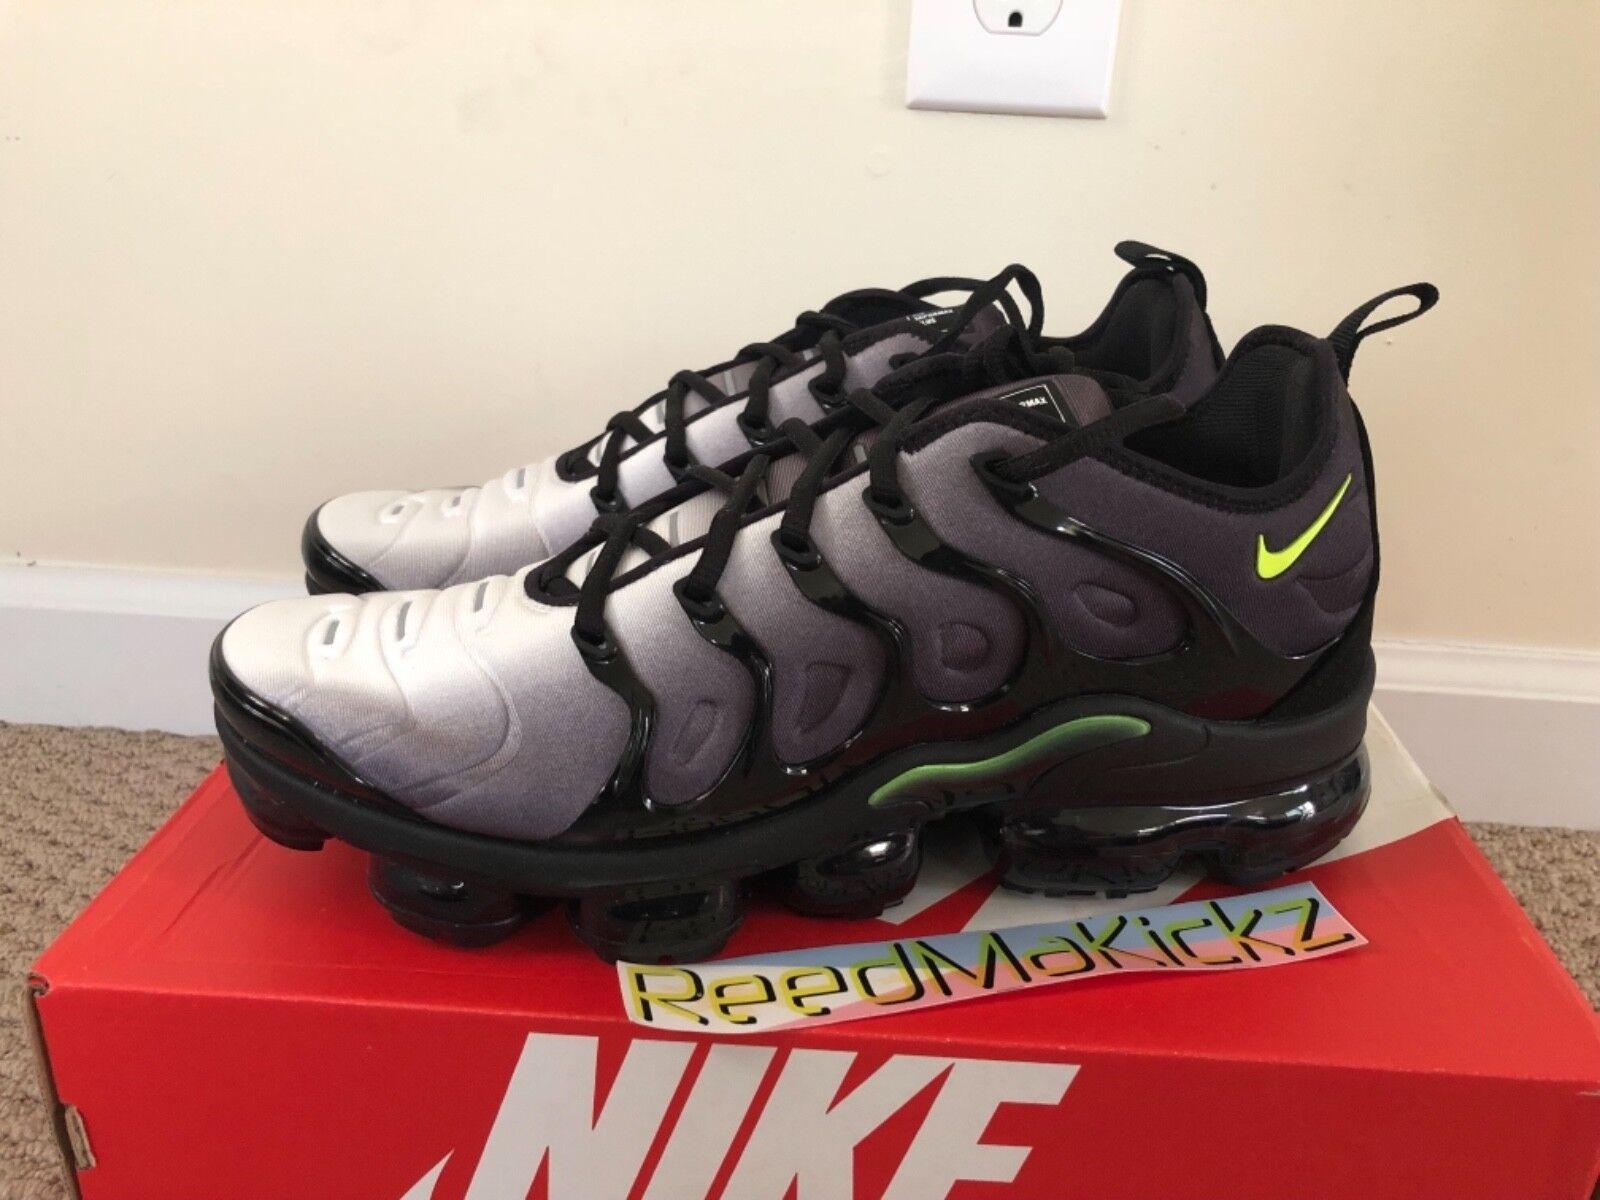 Nike Air Volt Vapormax plus Neon Black Volt Air Mens sizes 924453 009 e0a792